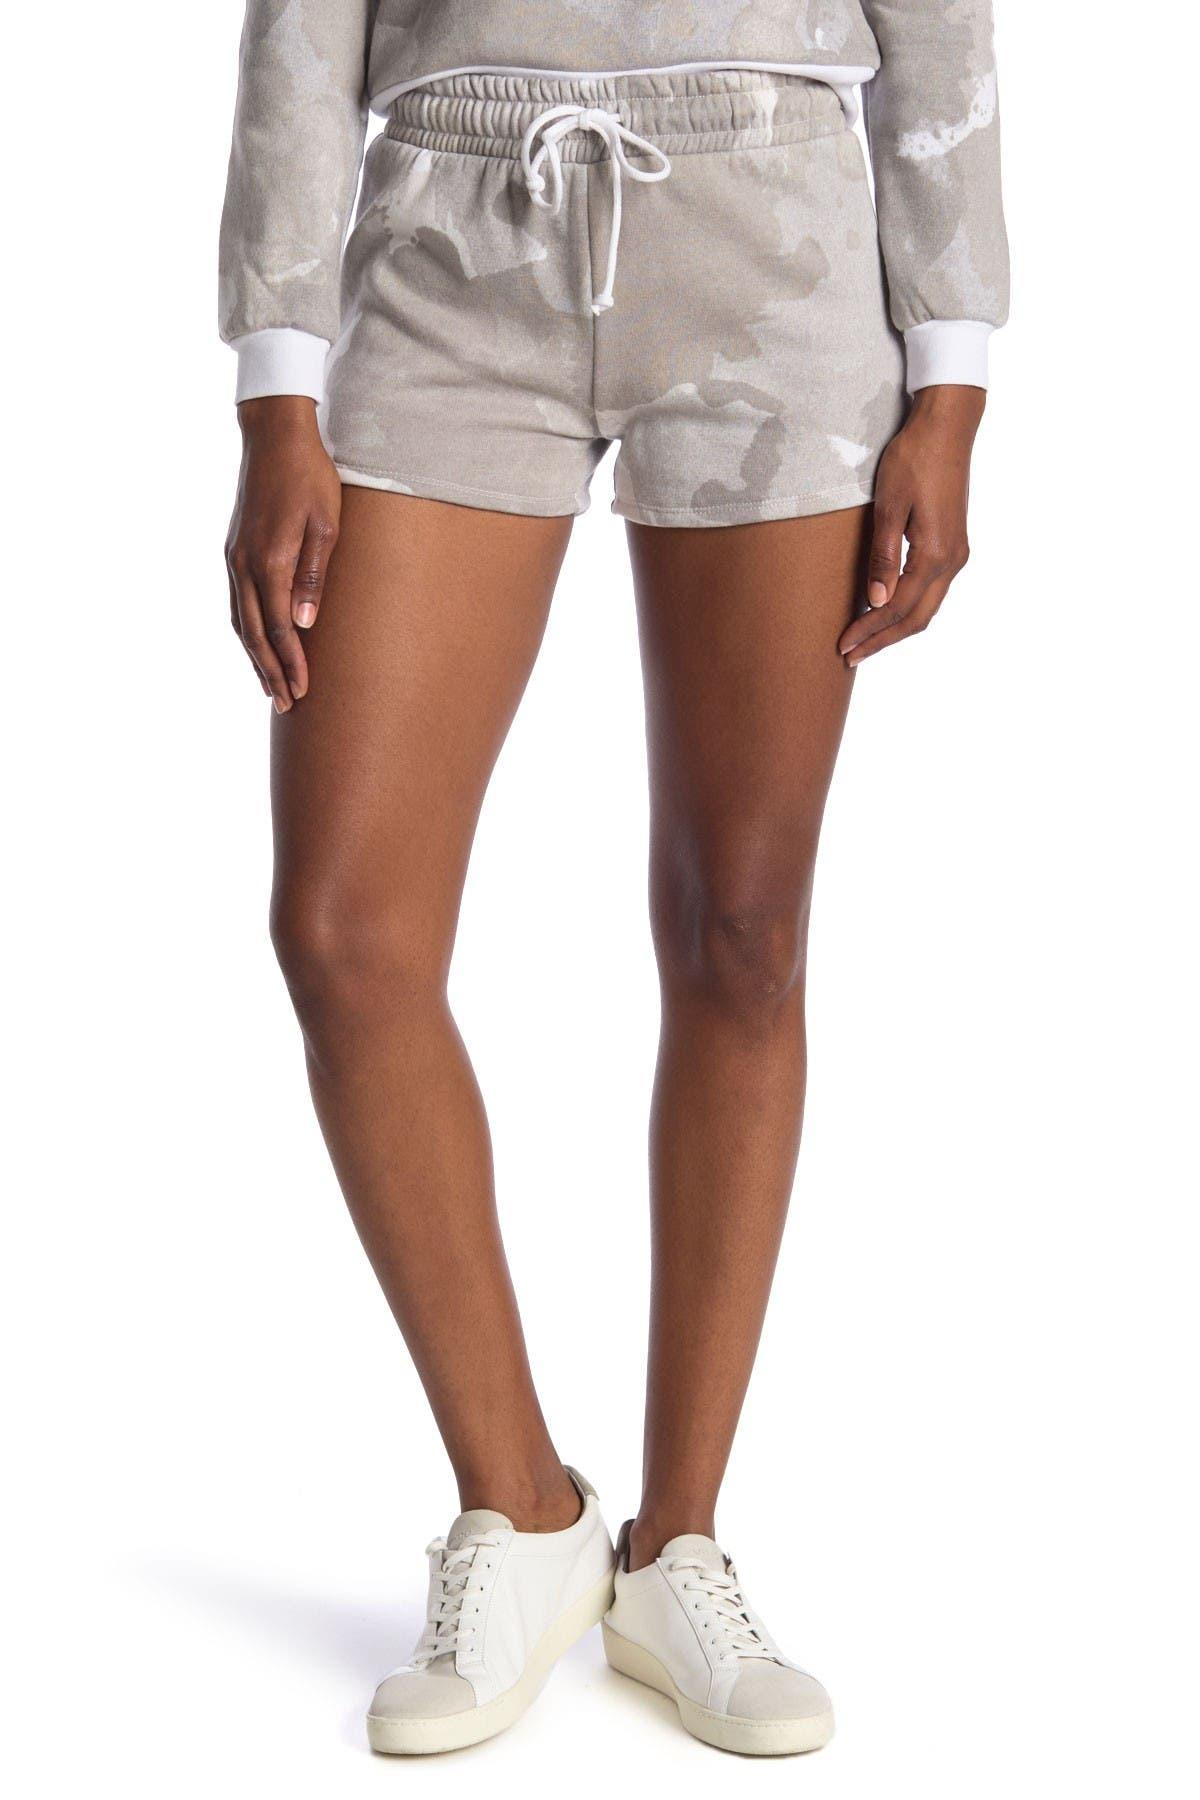 Image of Alternative Fleece Cozy Shorts